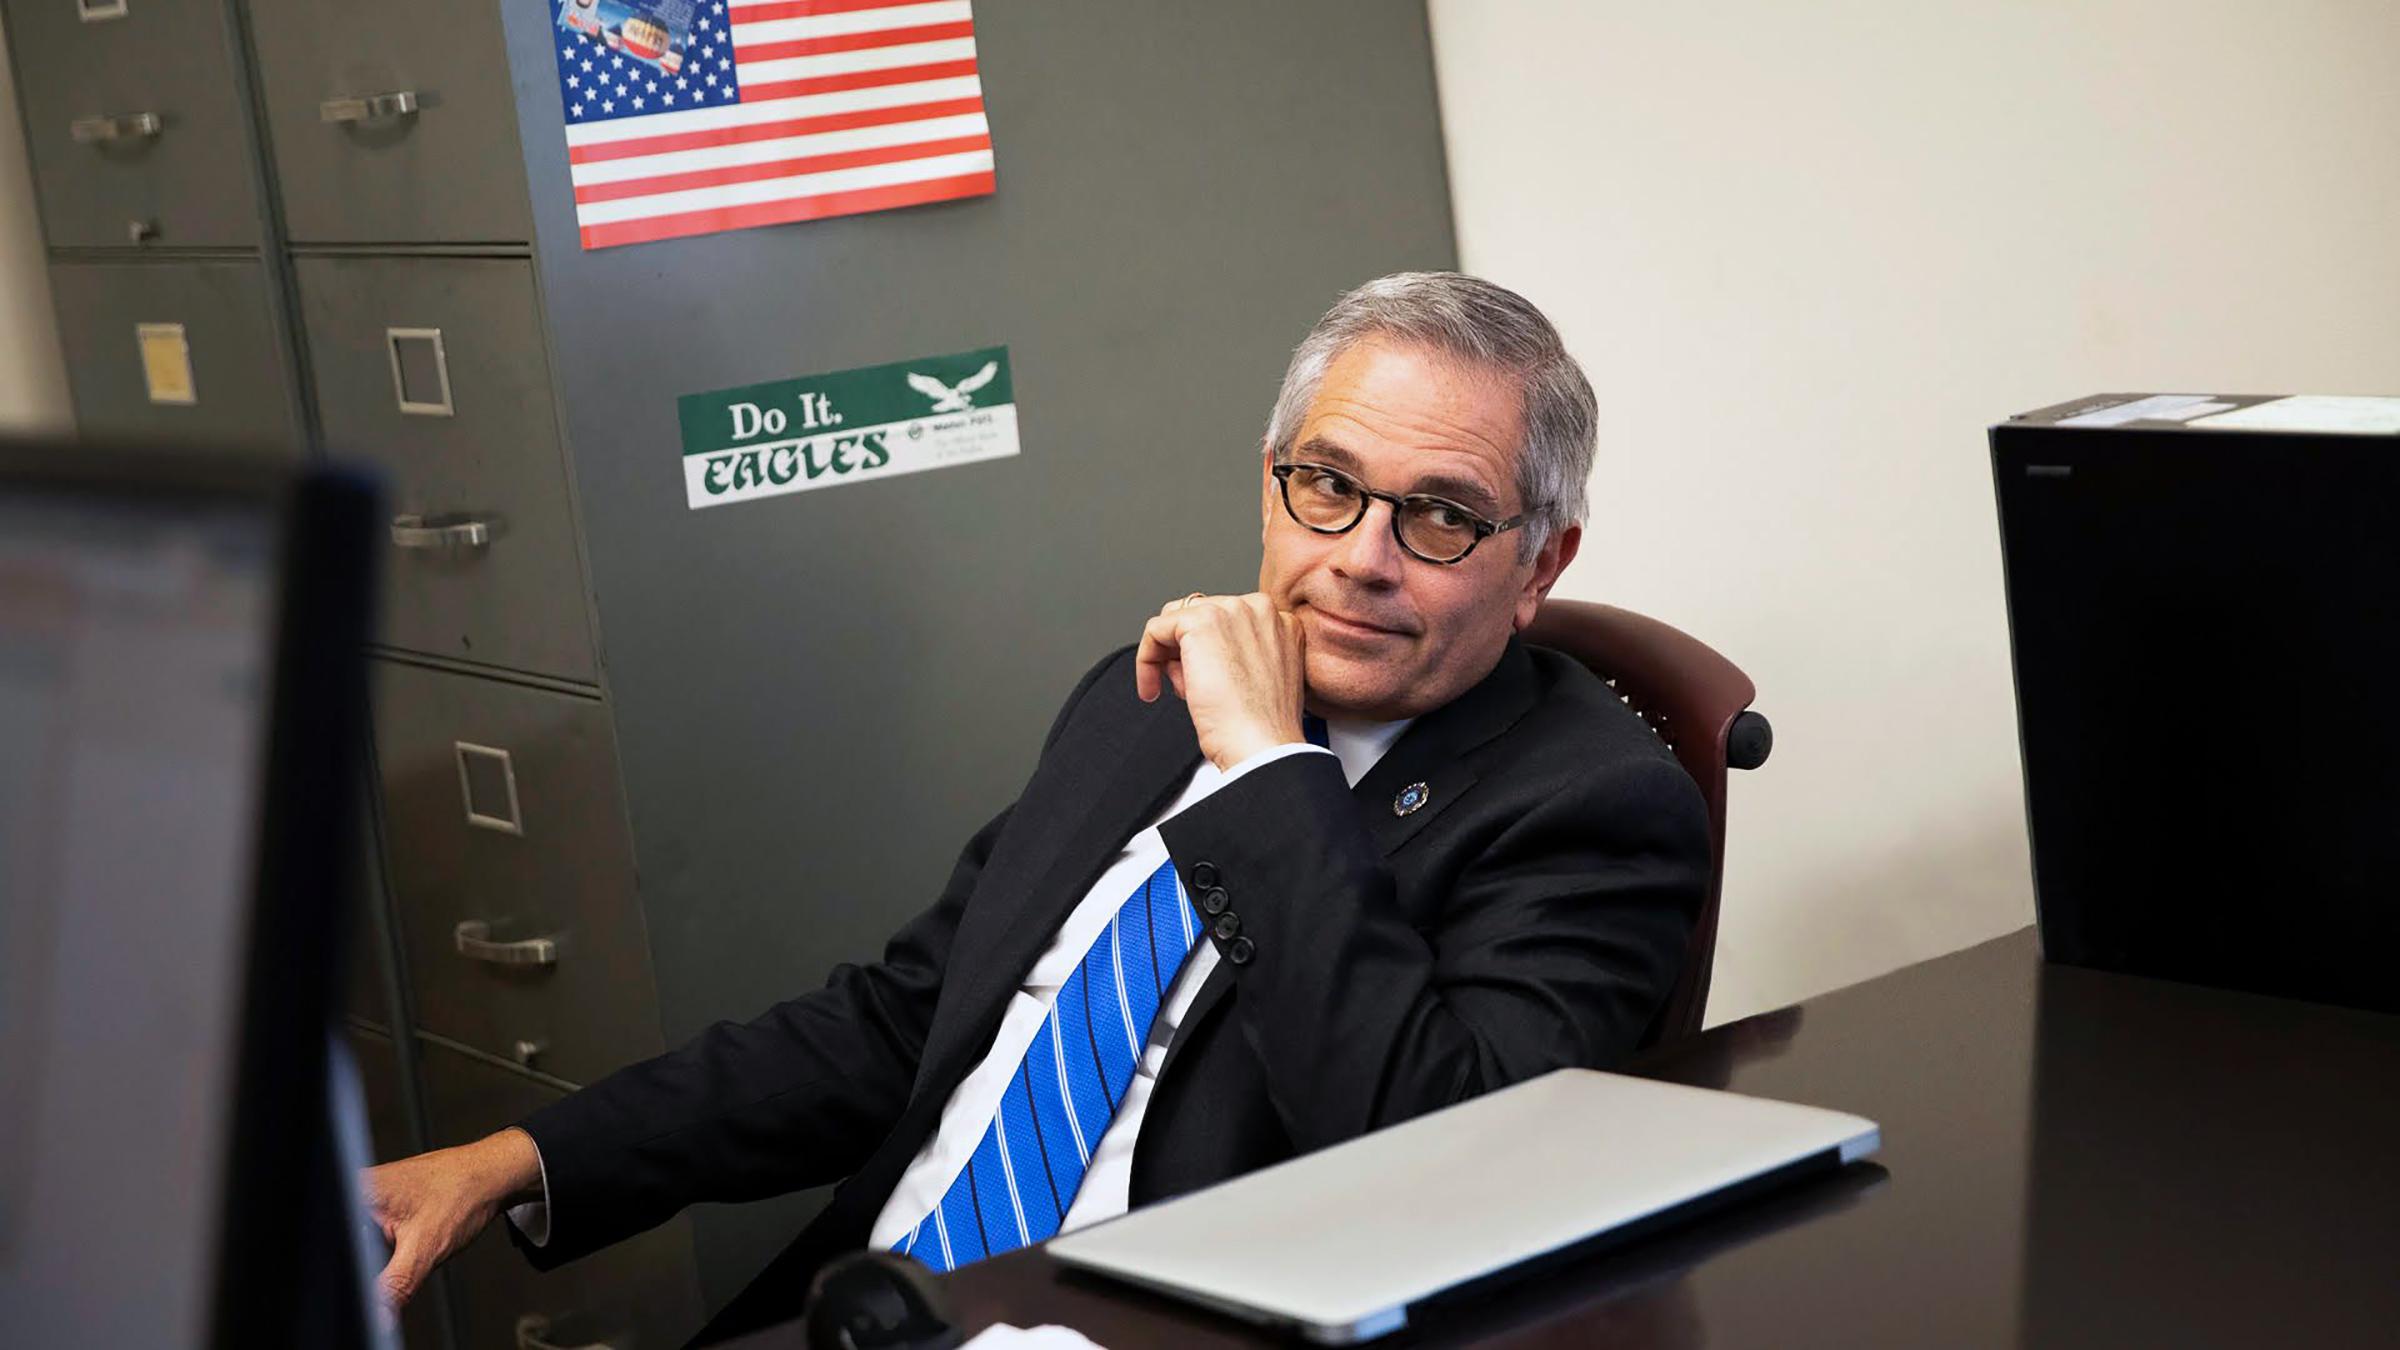 A documentary series about Philadelphia, Pennsylvania's progressive district attorney Larry Krasner.